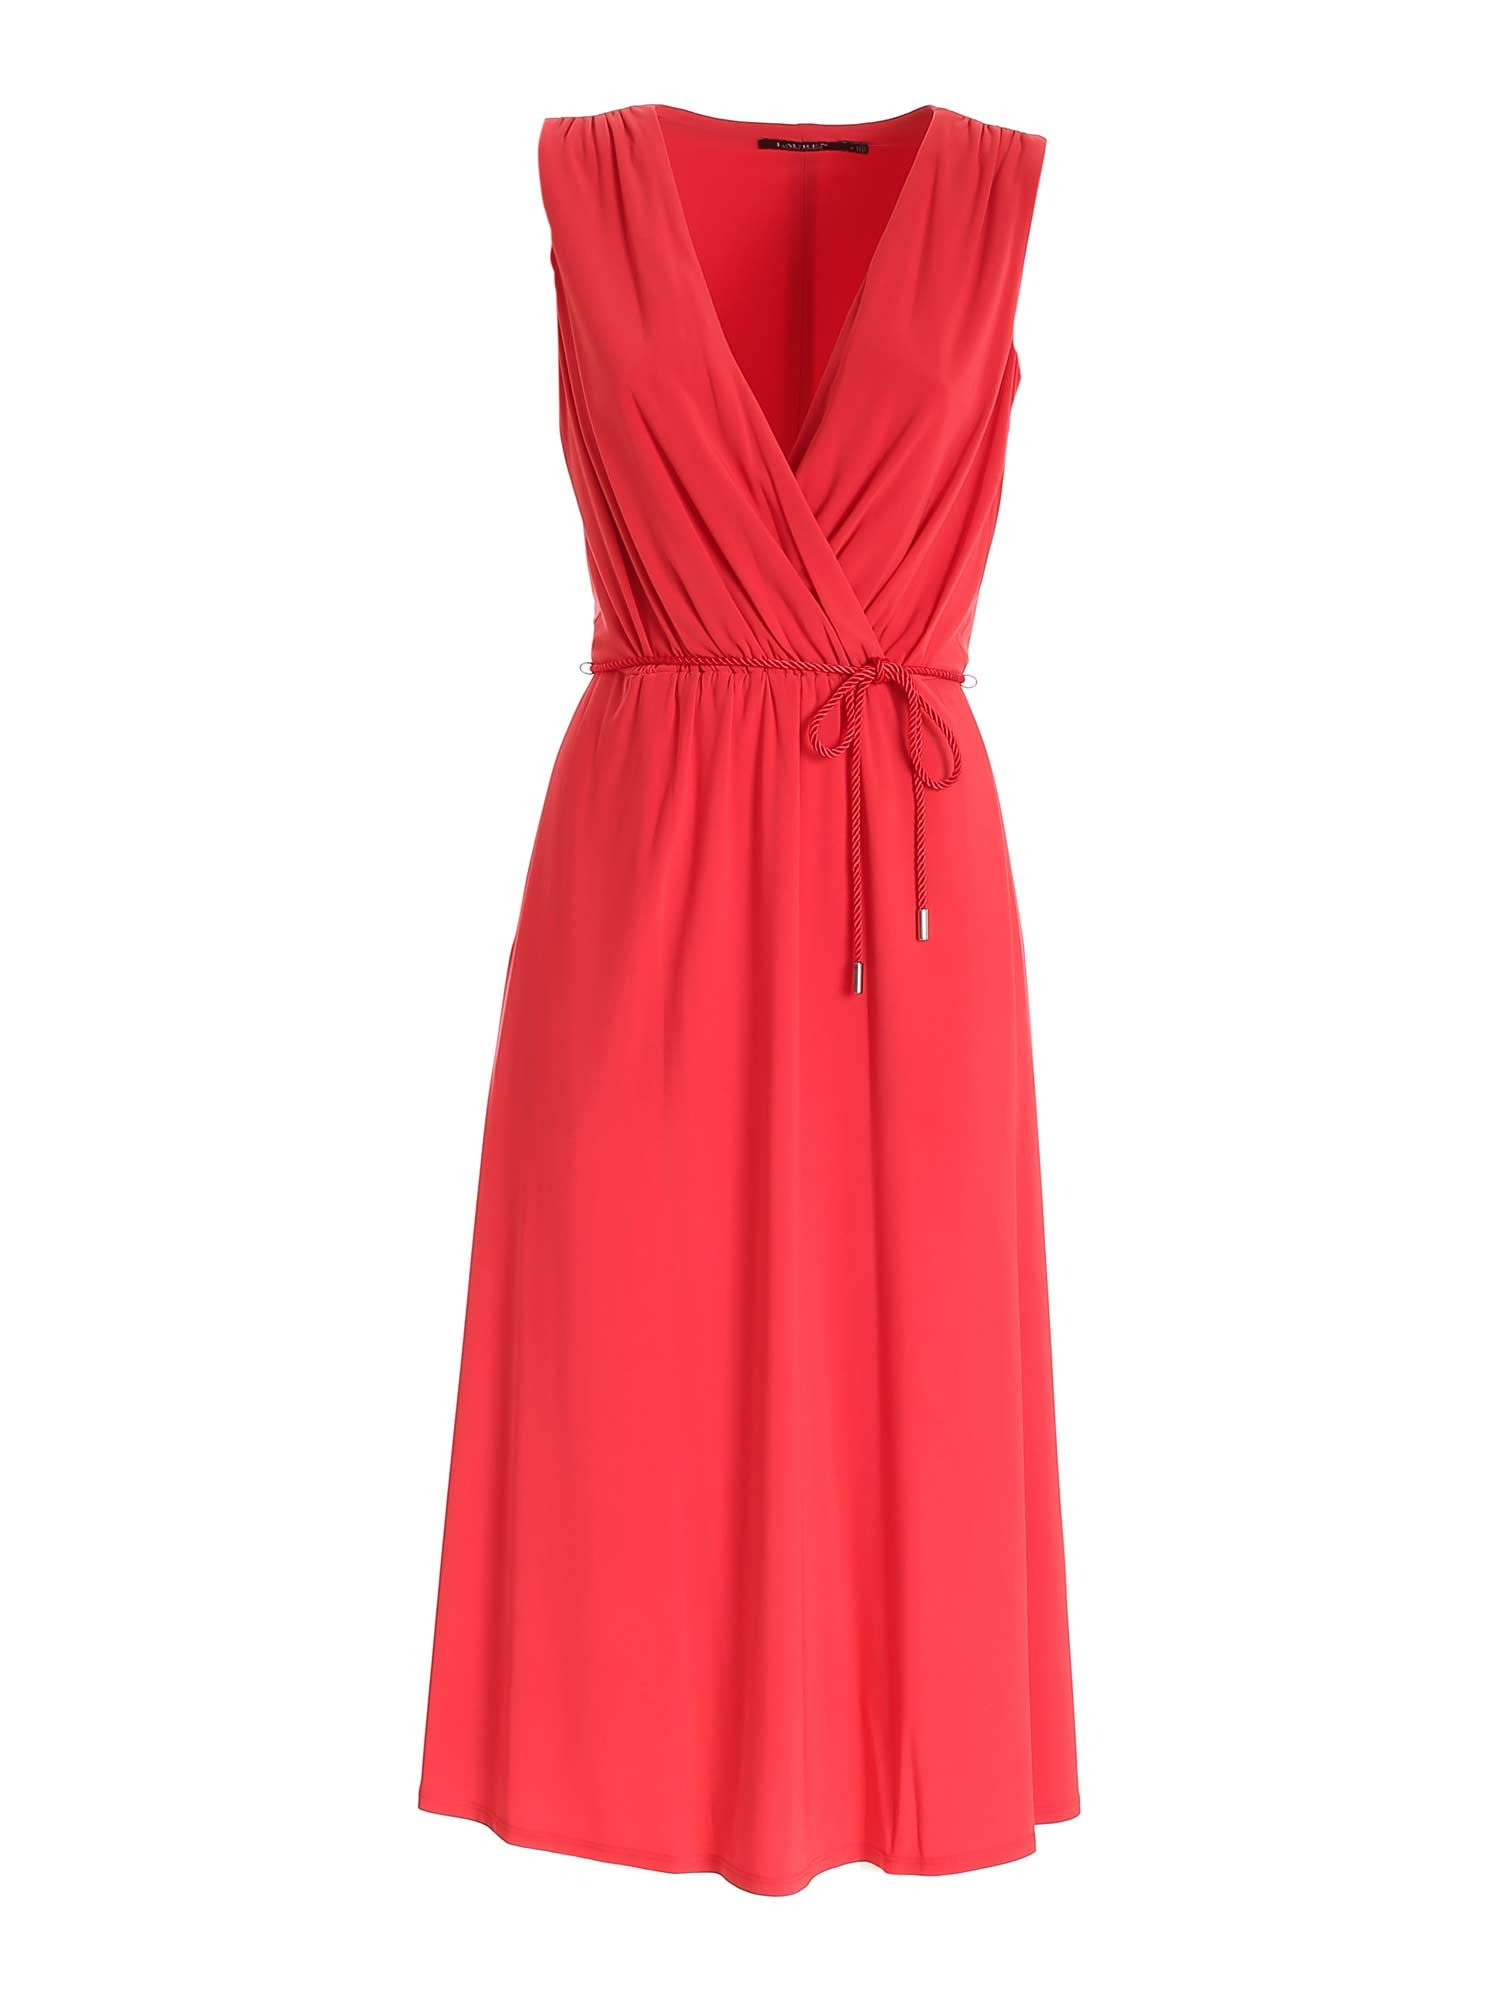 BELT DRESS IN RED POLO RALPH LAUREN | 11 | 250830125001